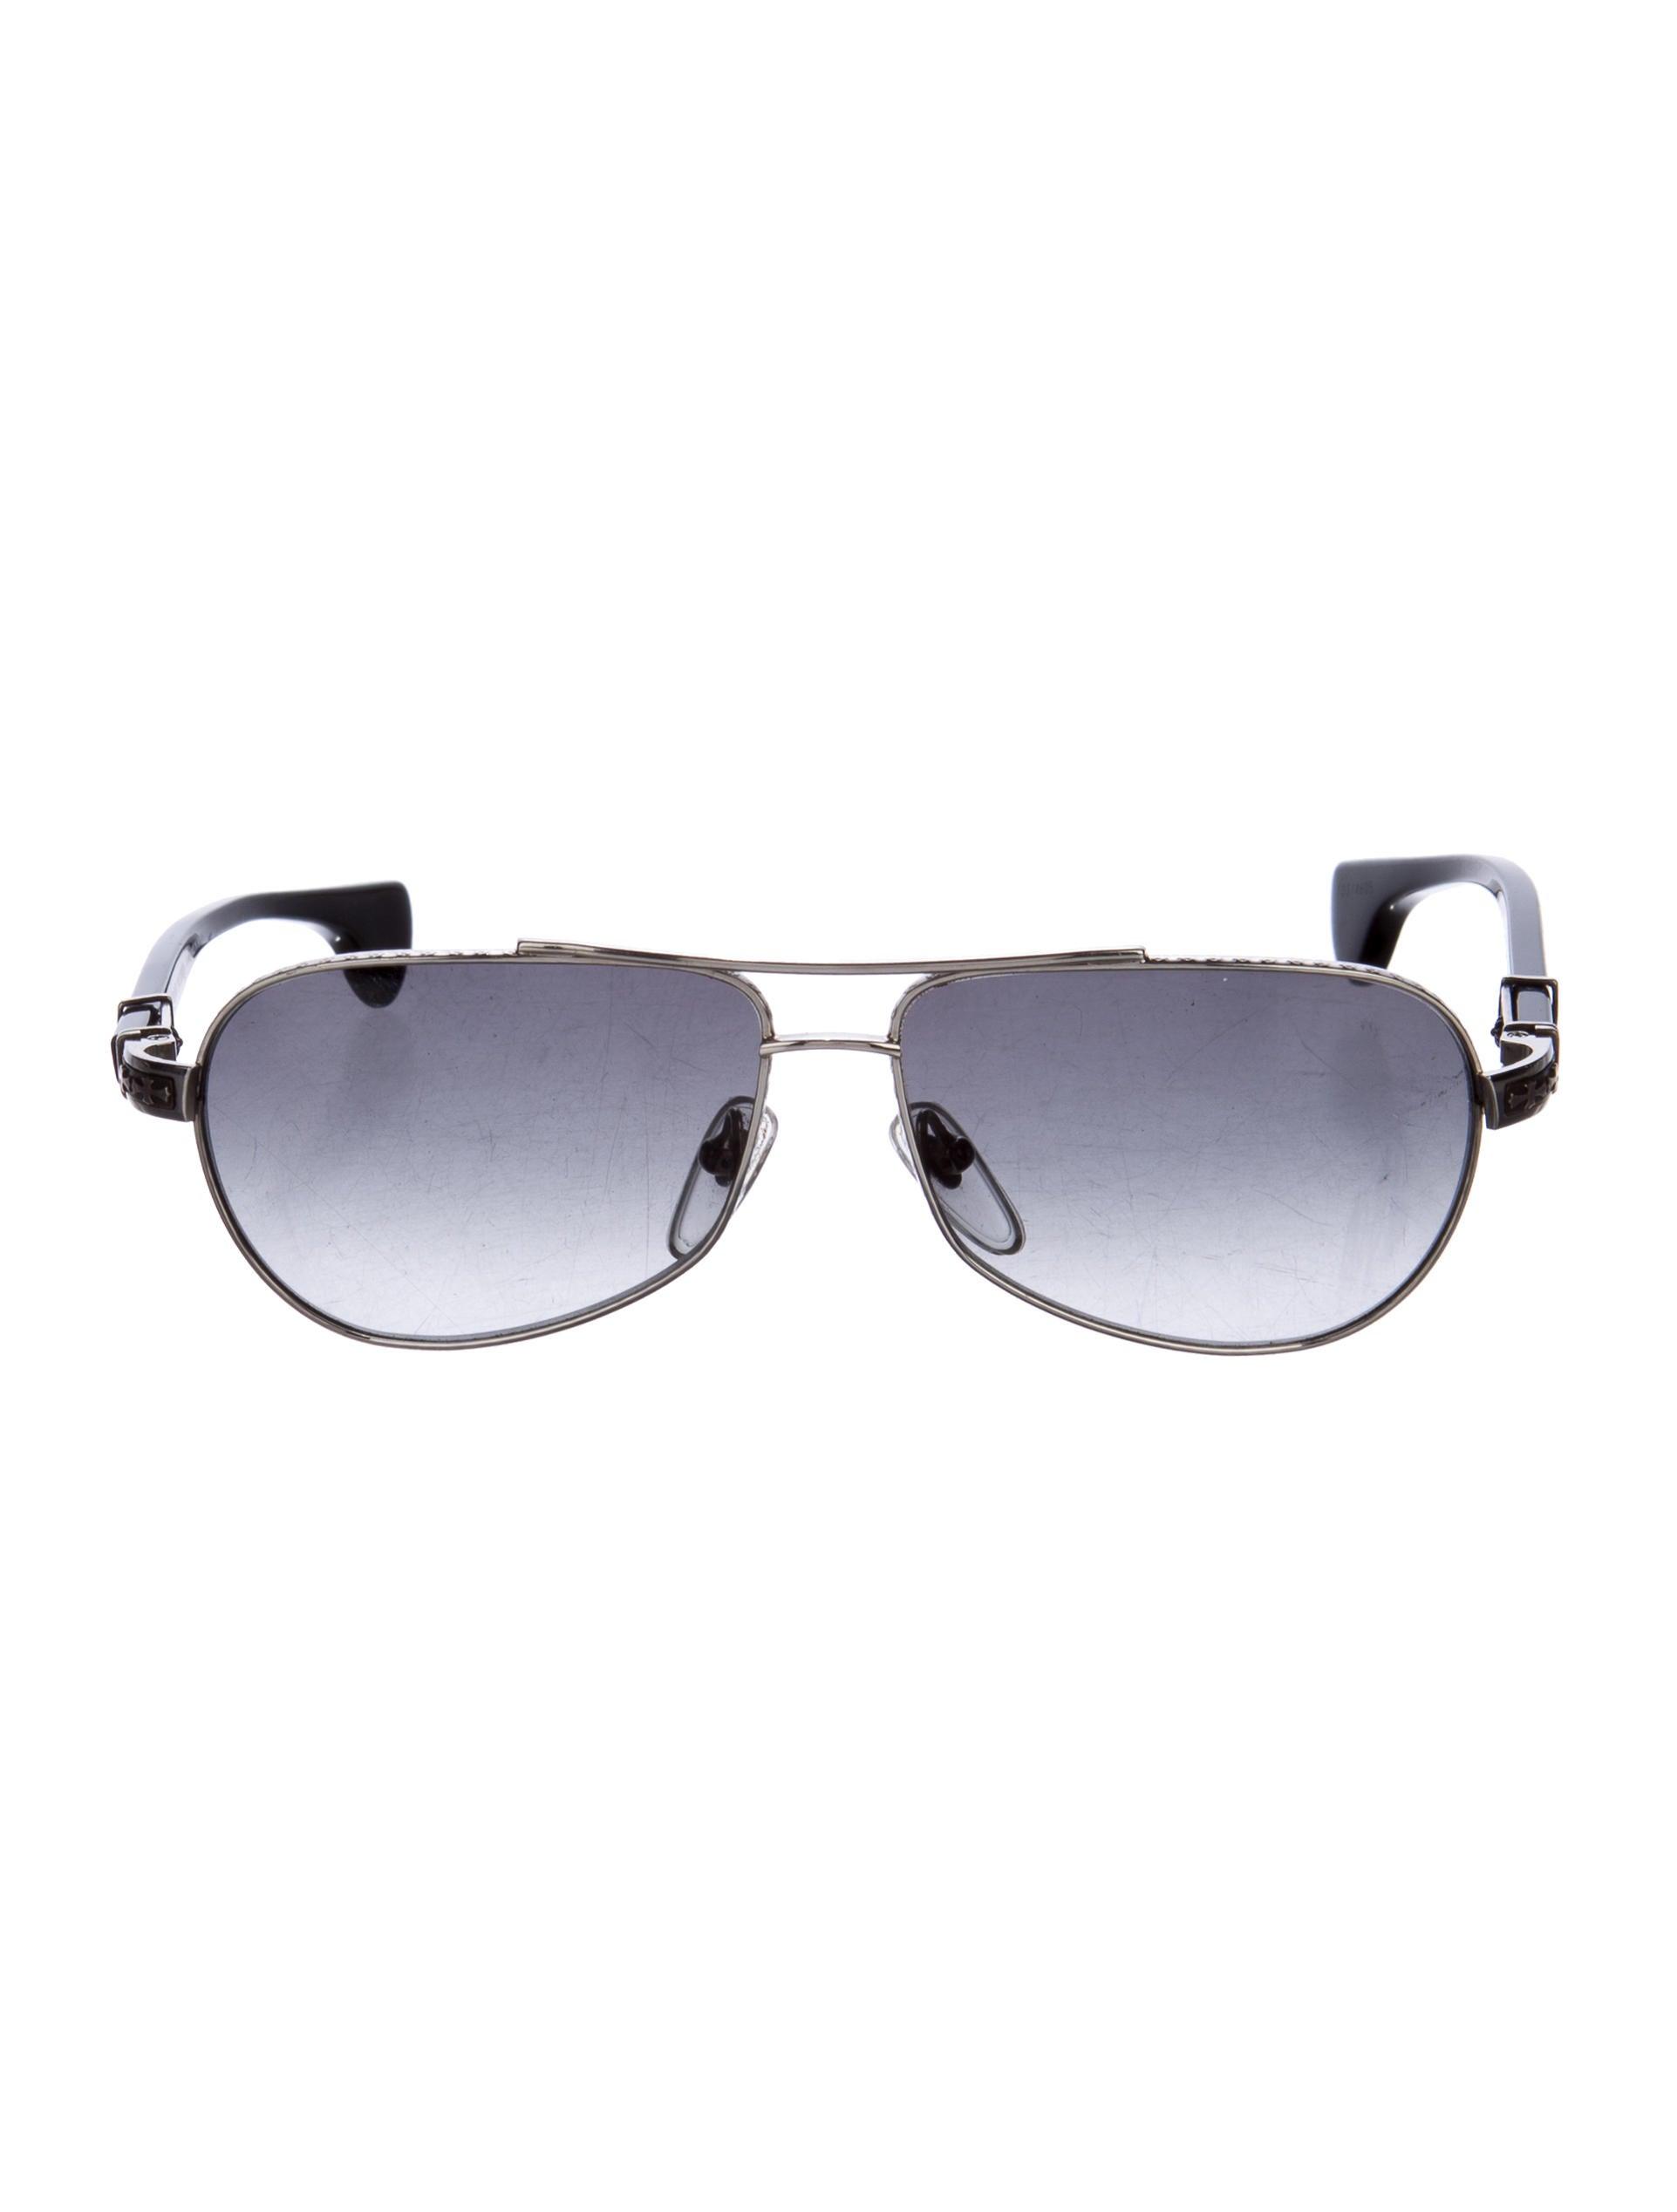 c22b4d867e1 Chrome Hearts Sunglasses Beast 1